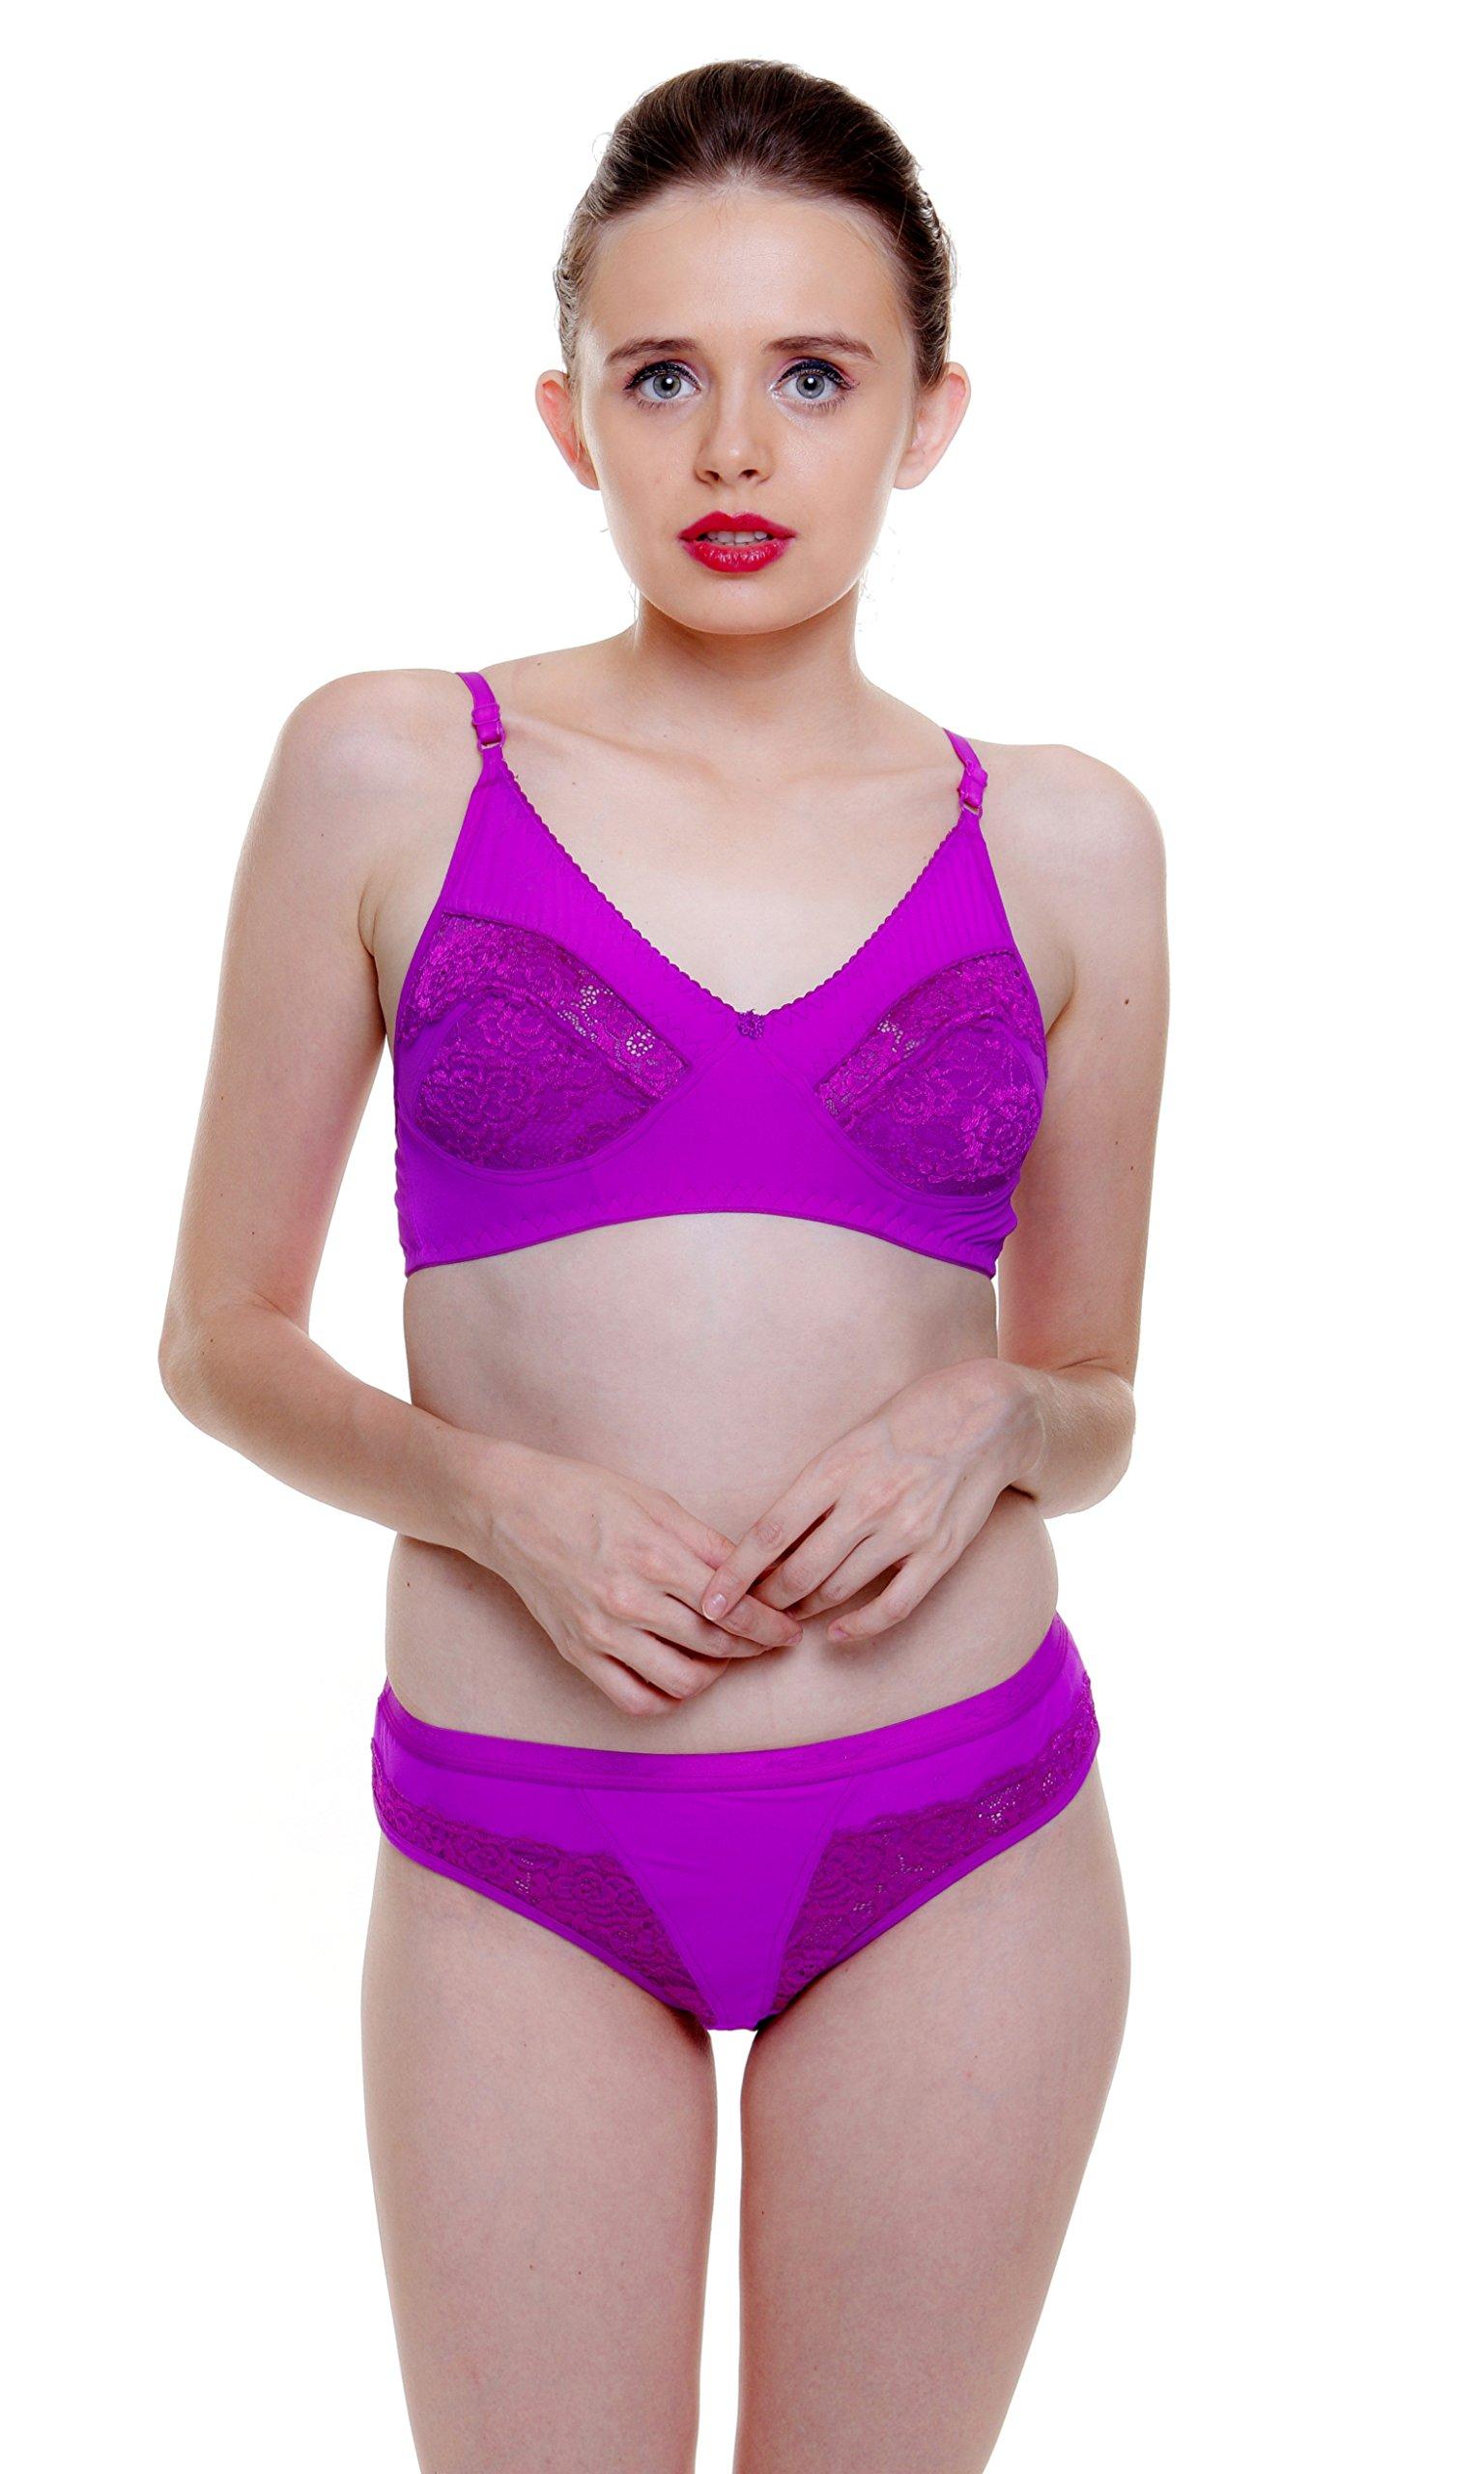 40f846c415a Fashion Comfortz Women s Lace Bra   Panty Set – Buy Bestow